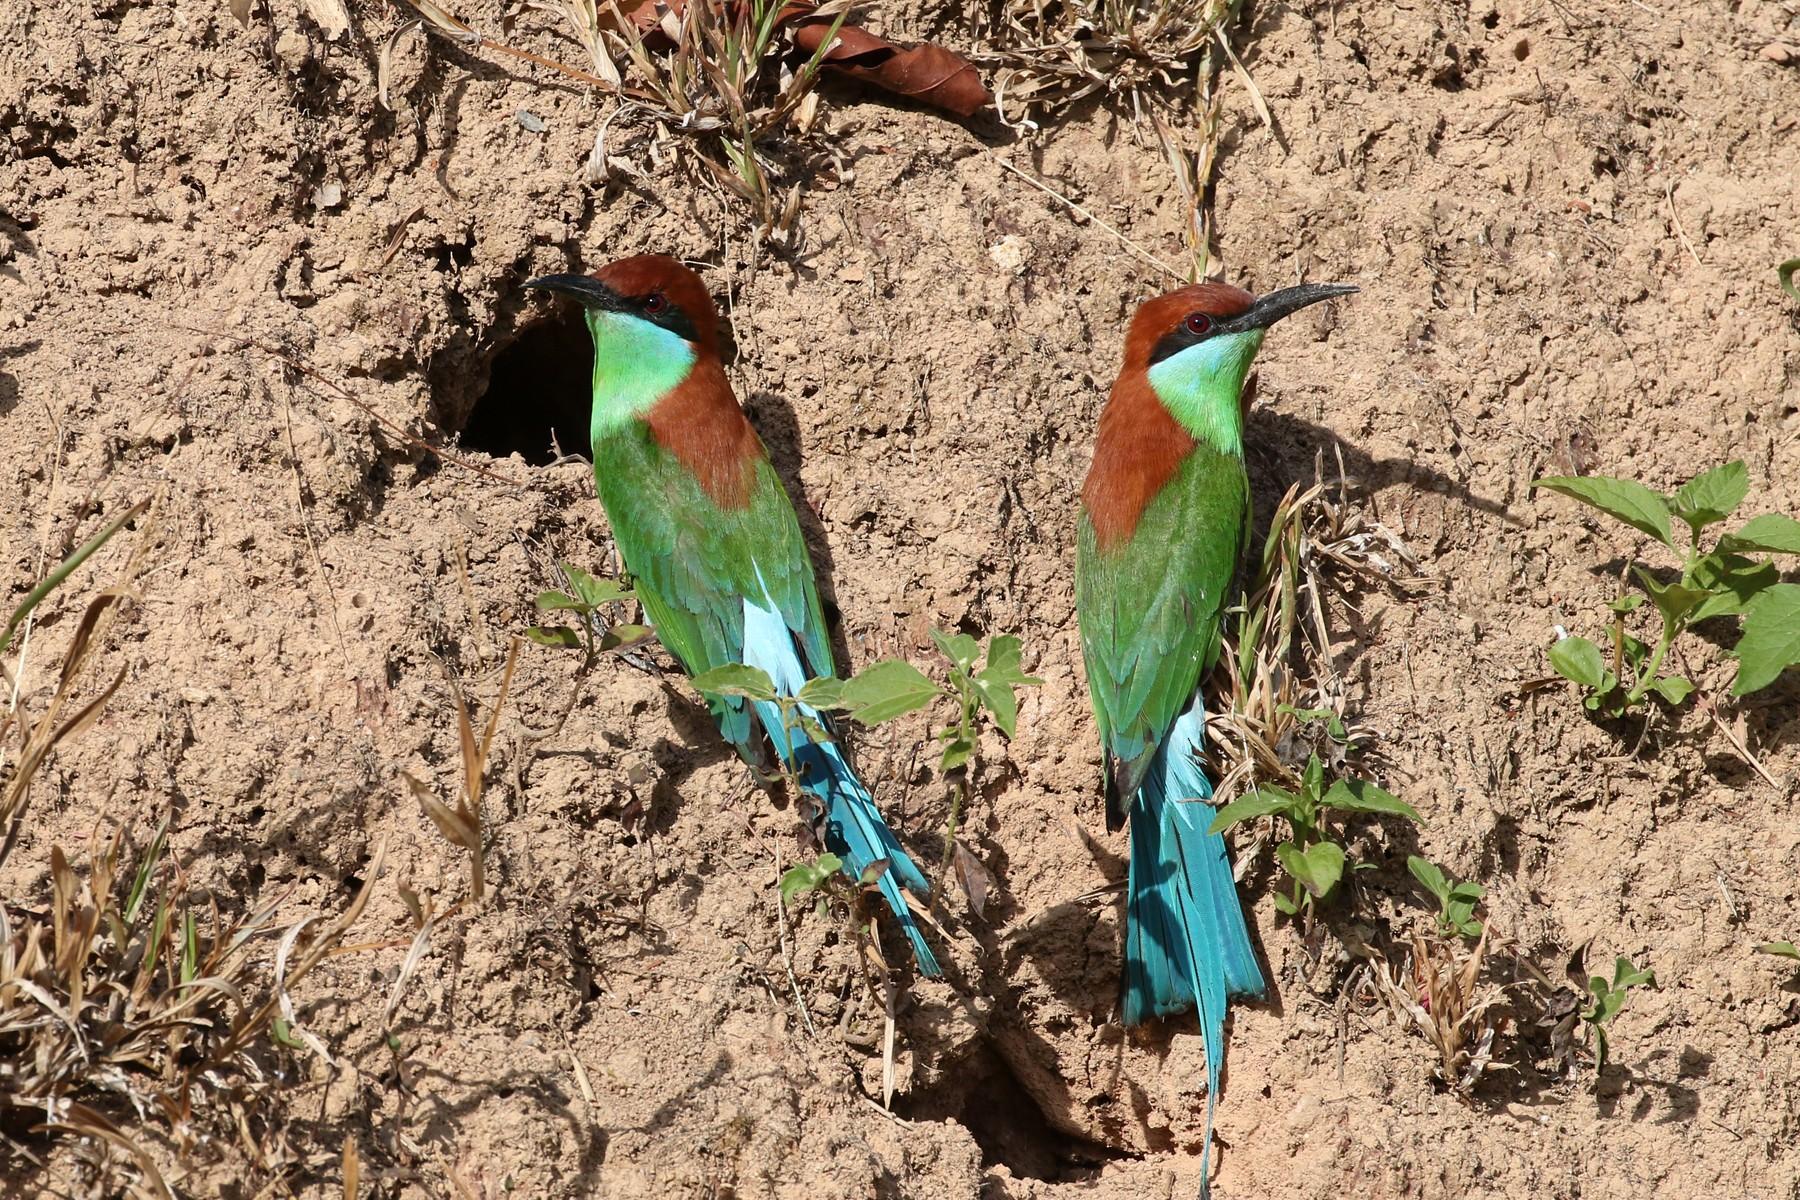 Rufous-crowned Bee-eater - Charley Hesse TROPICAL BIRDING